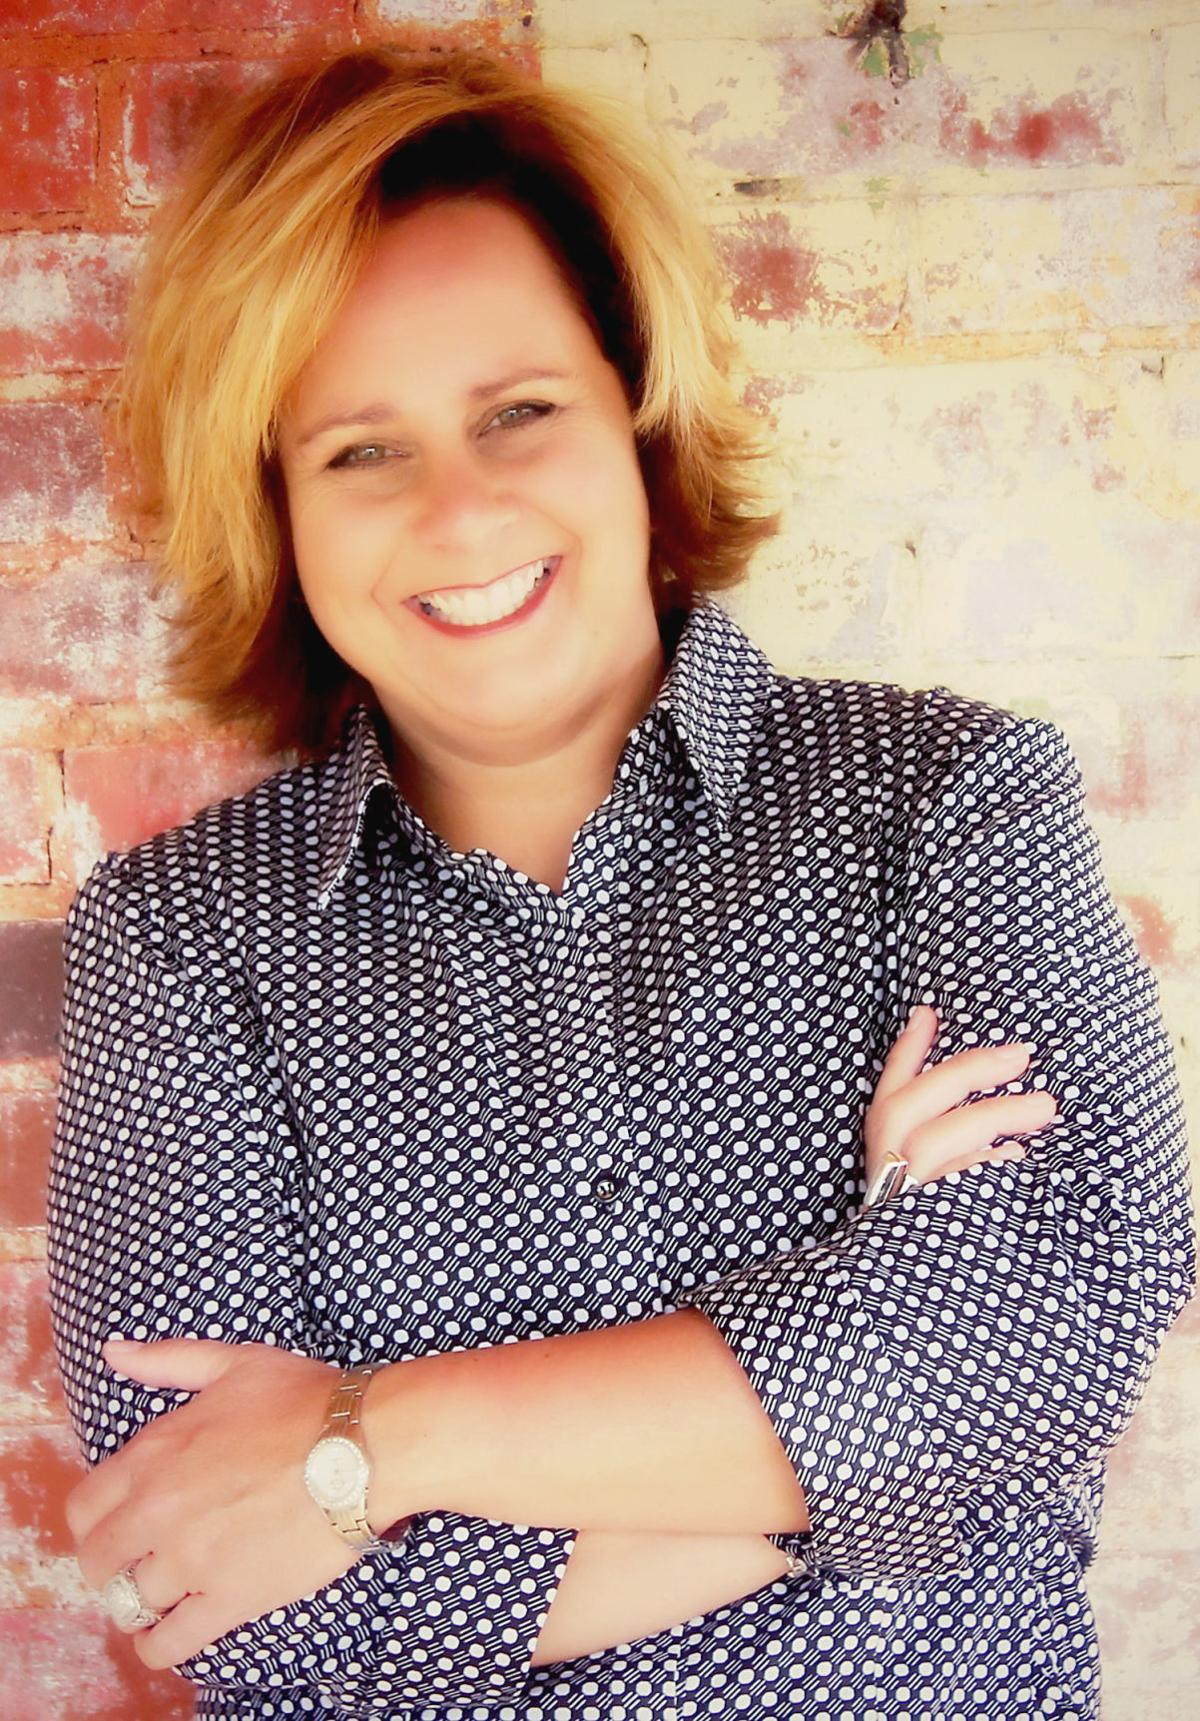 Berrien author takes global platform